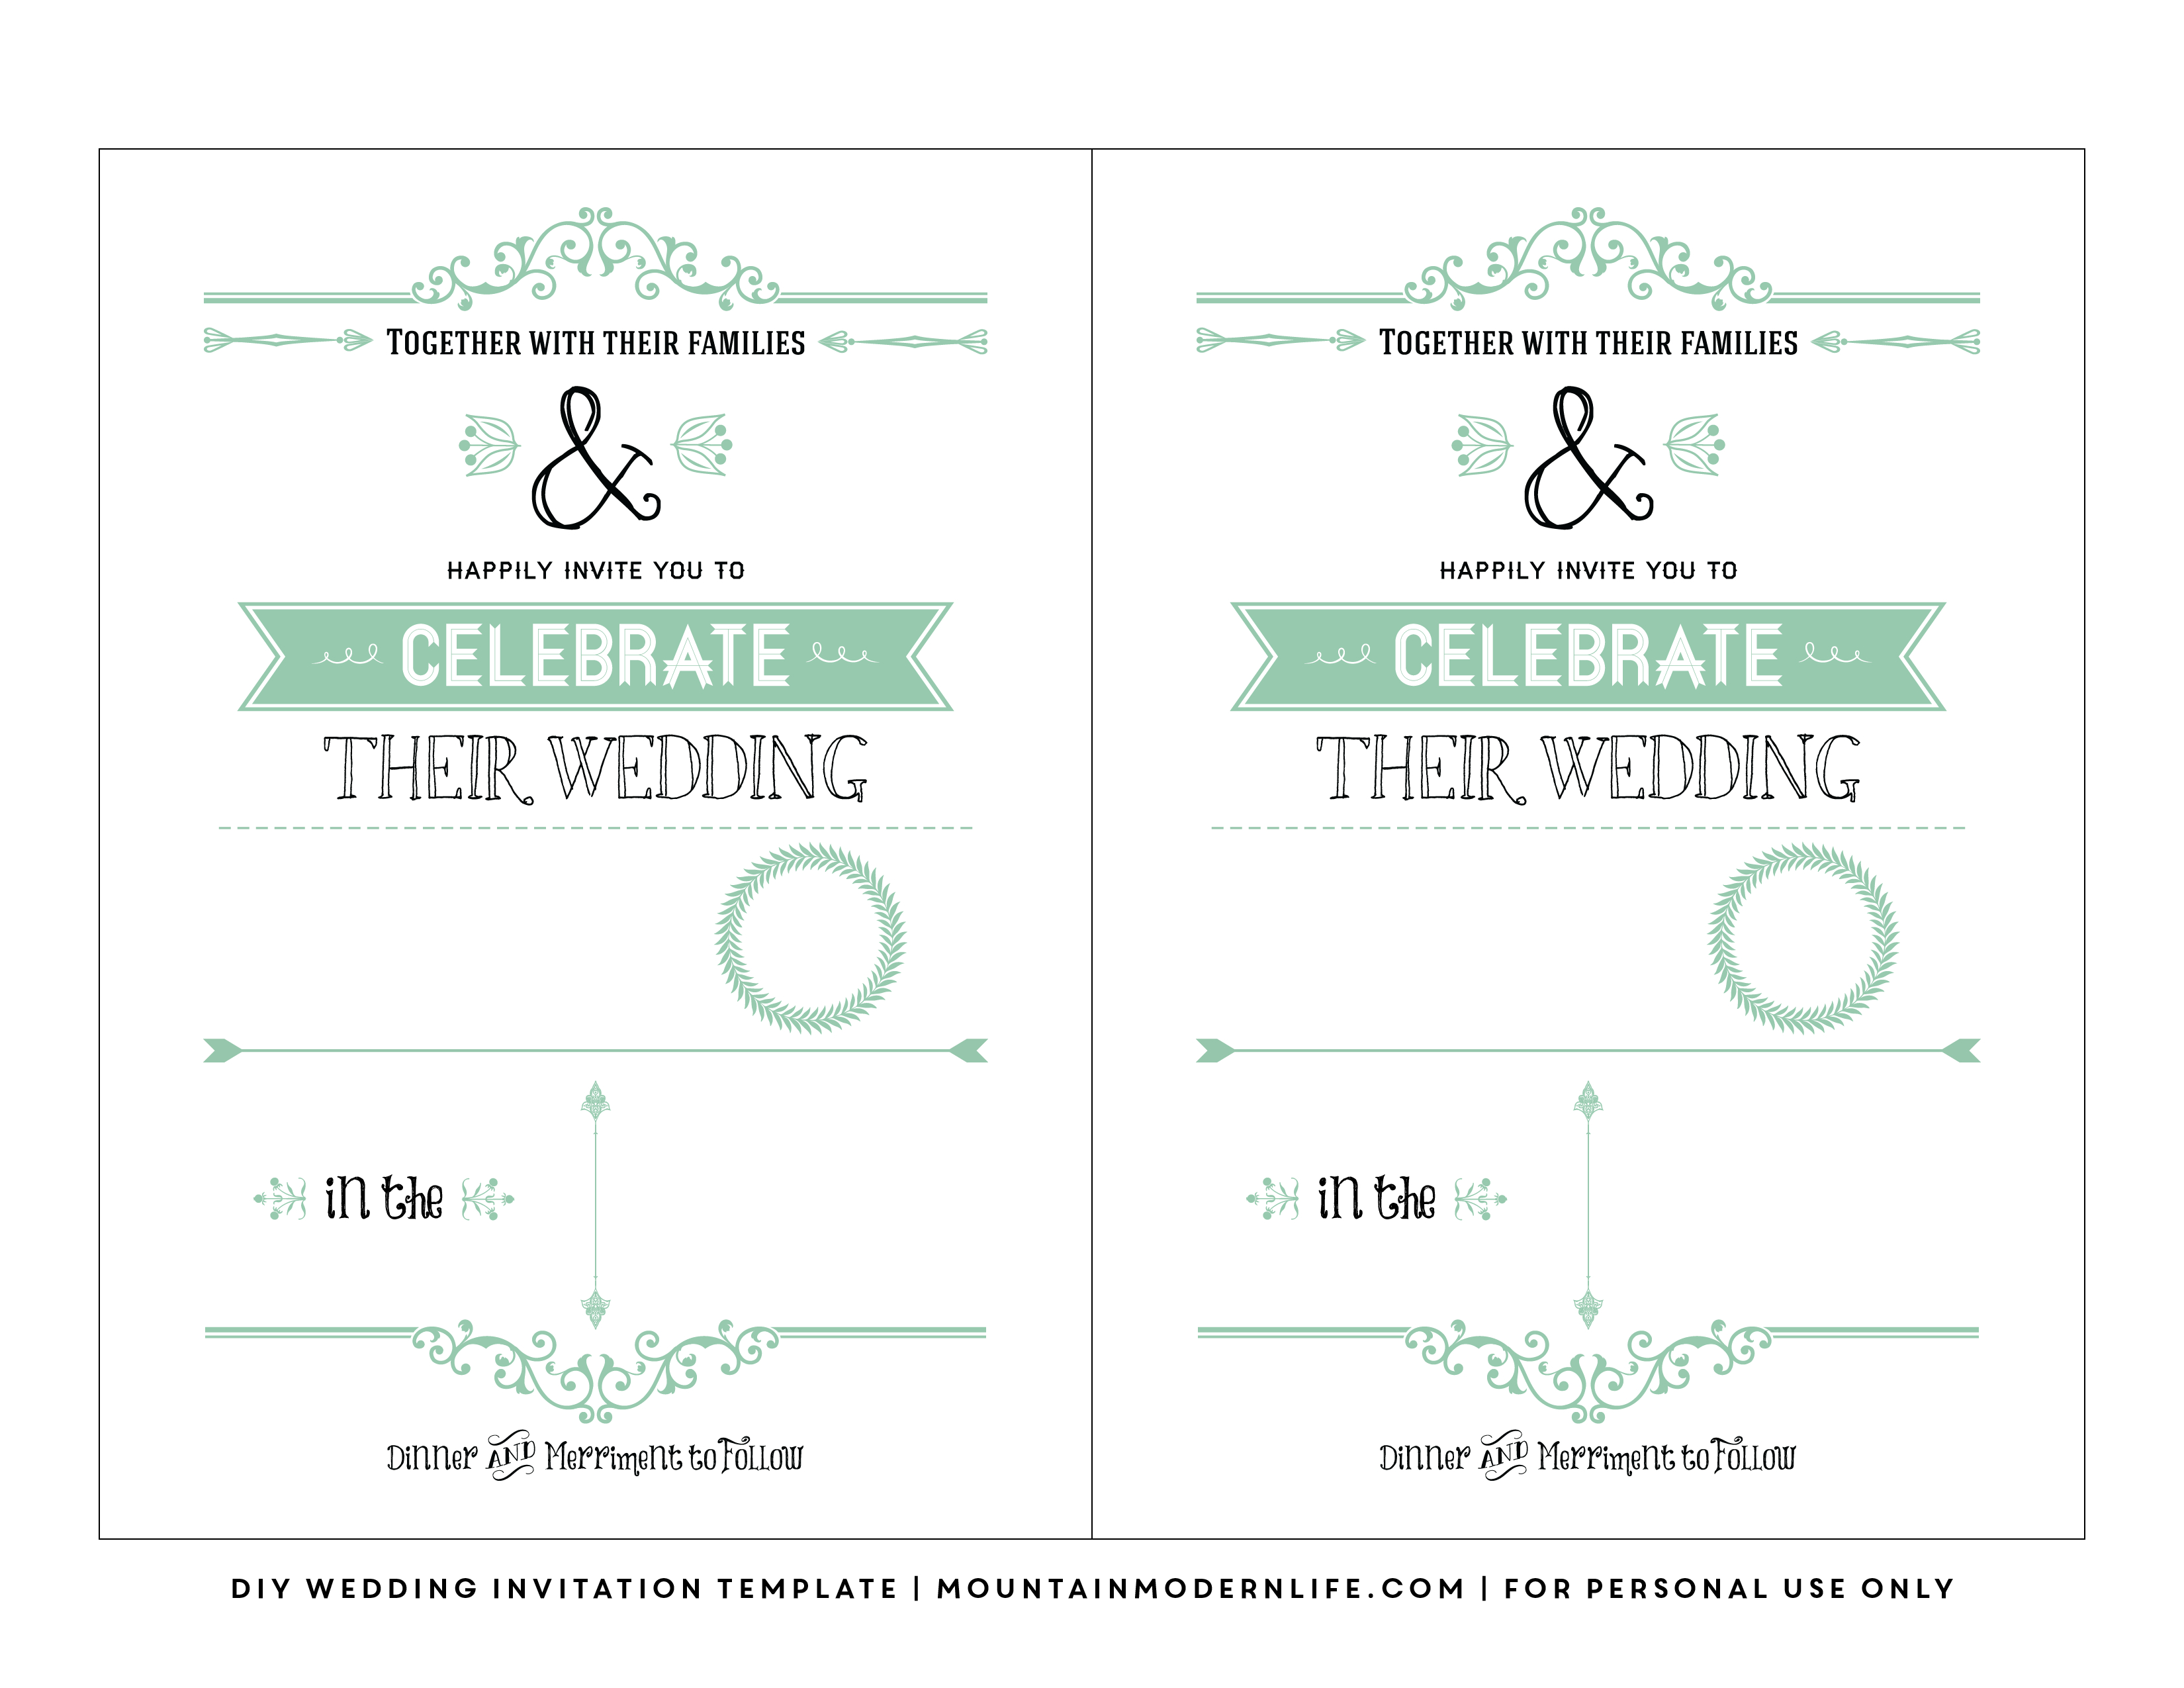 Free Wedding Invitation Template | Mountainmodernlife - Free Printable Wedding Invitation Templates